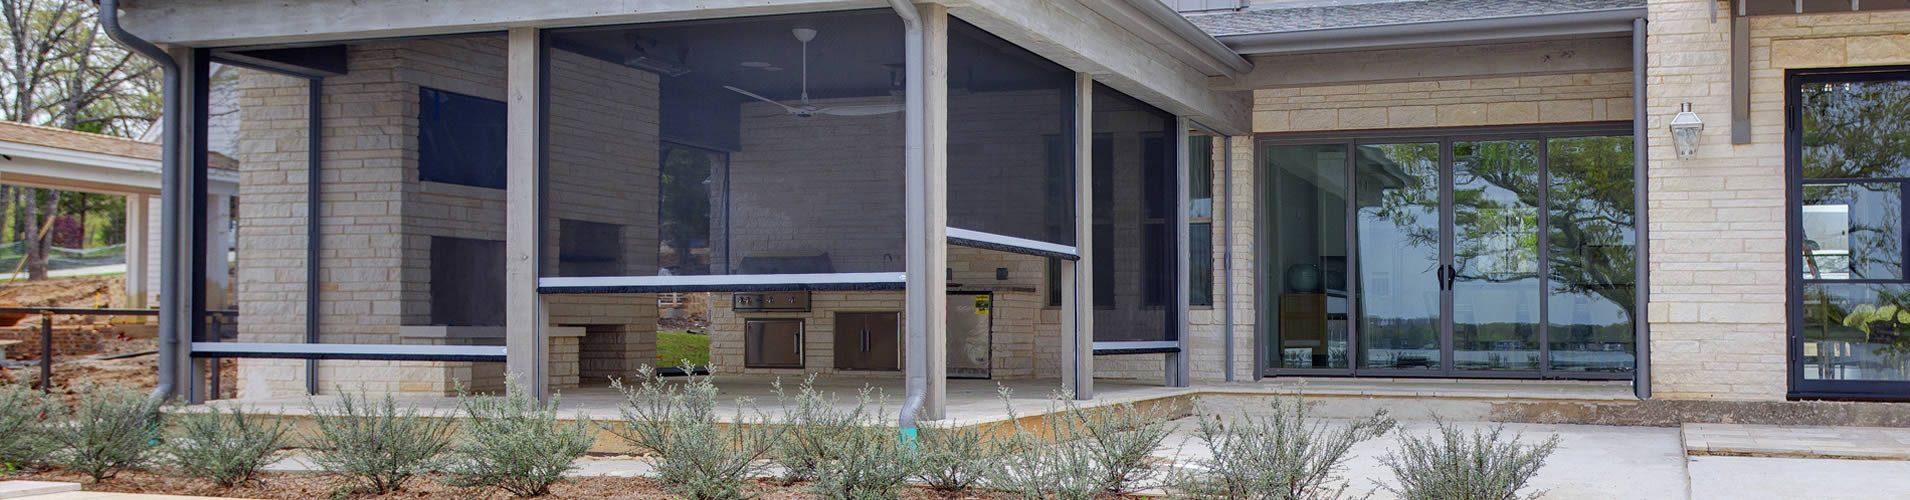 Dallas motorized patio shades